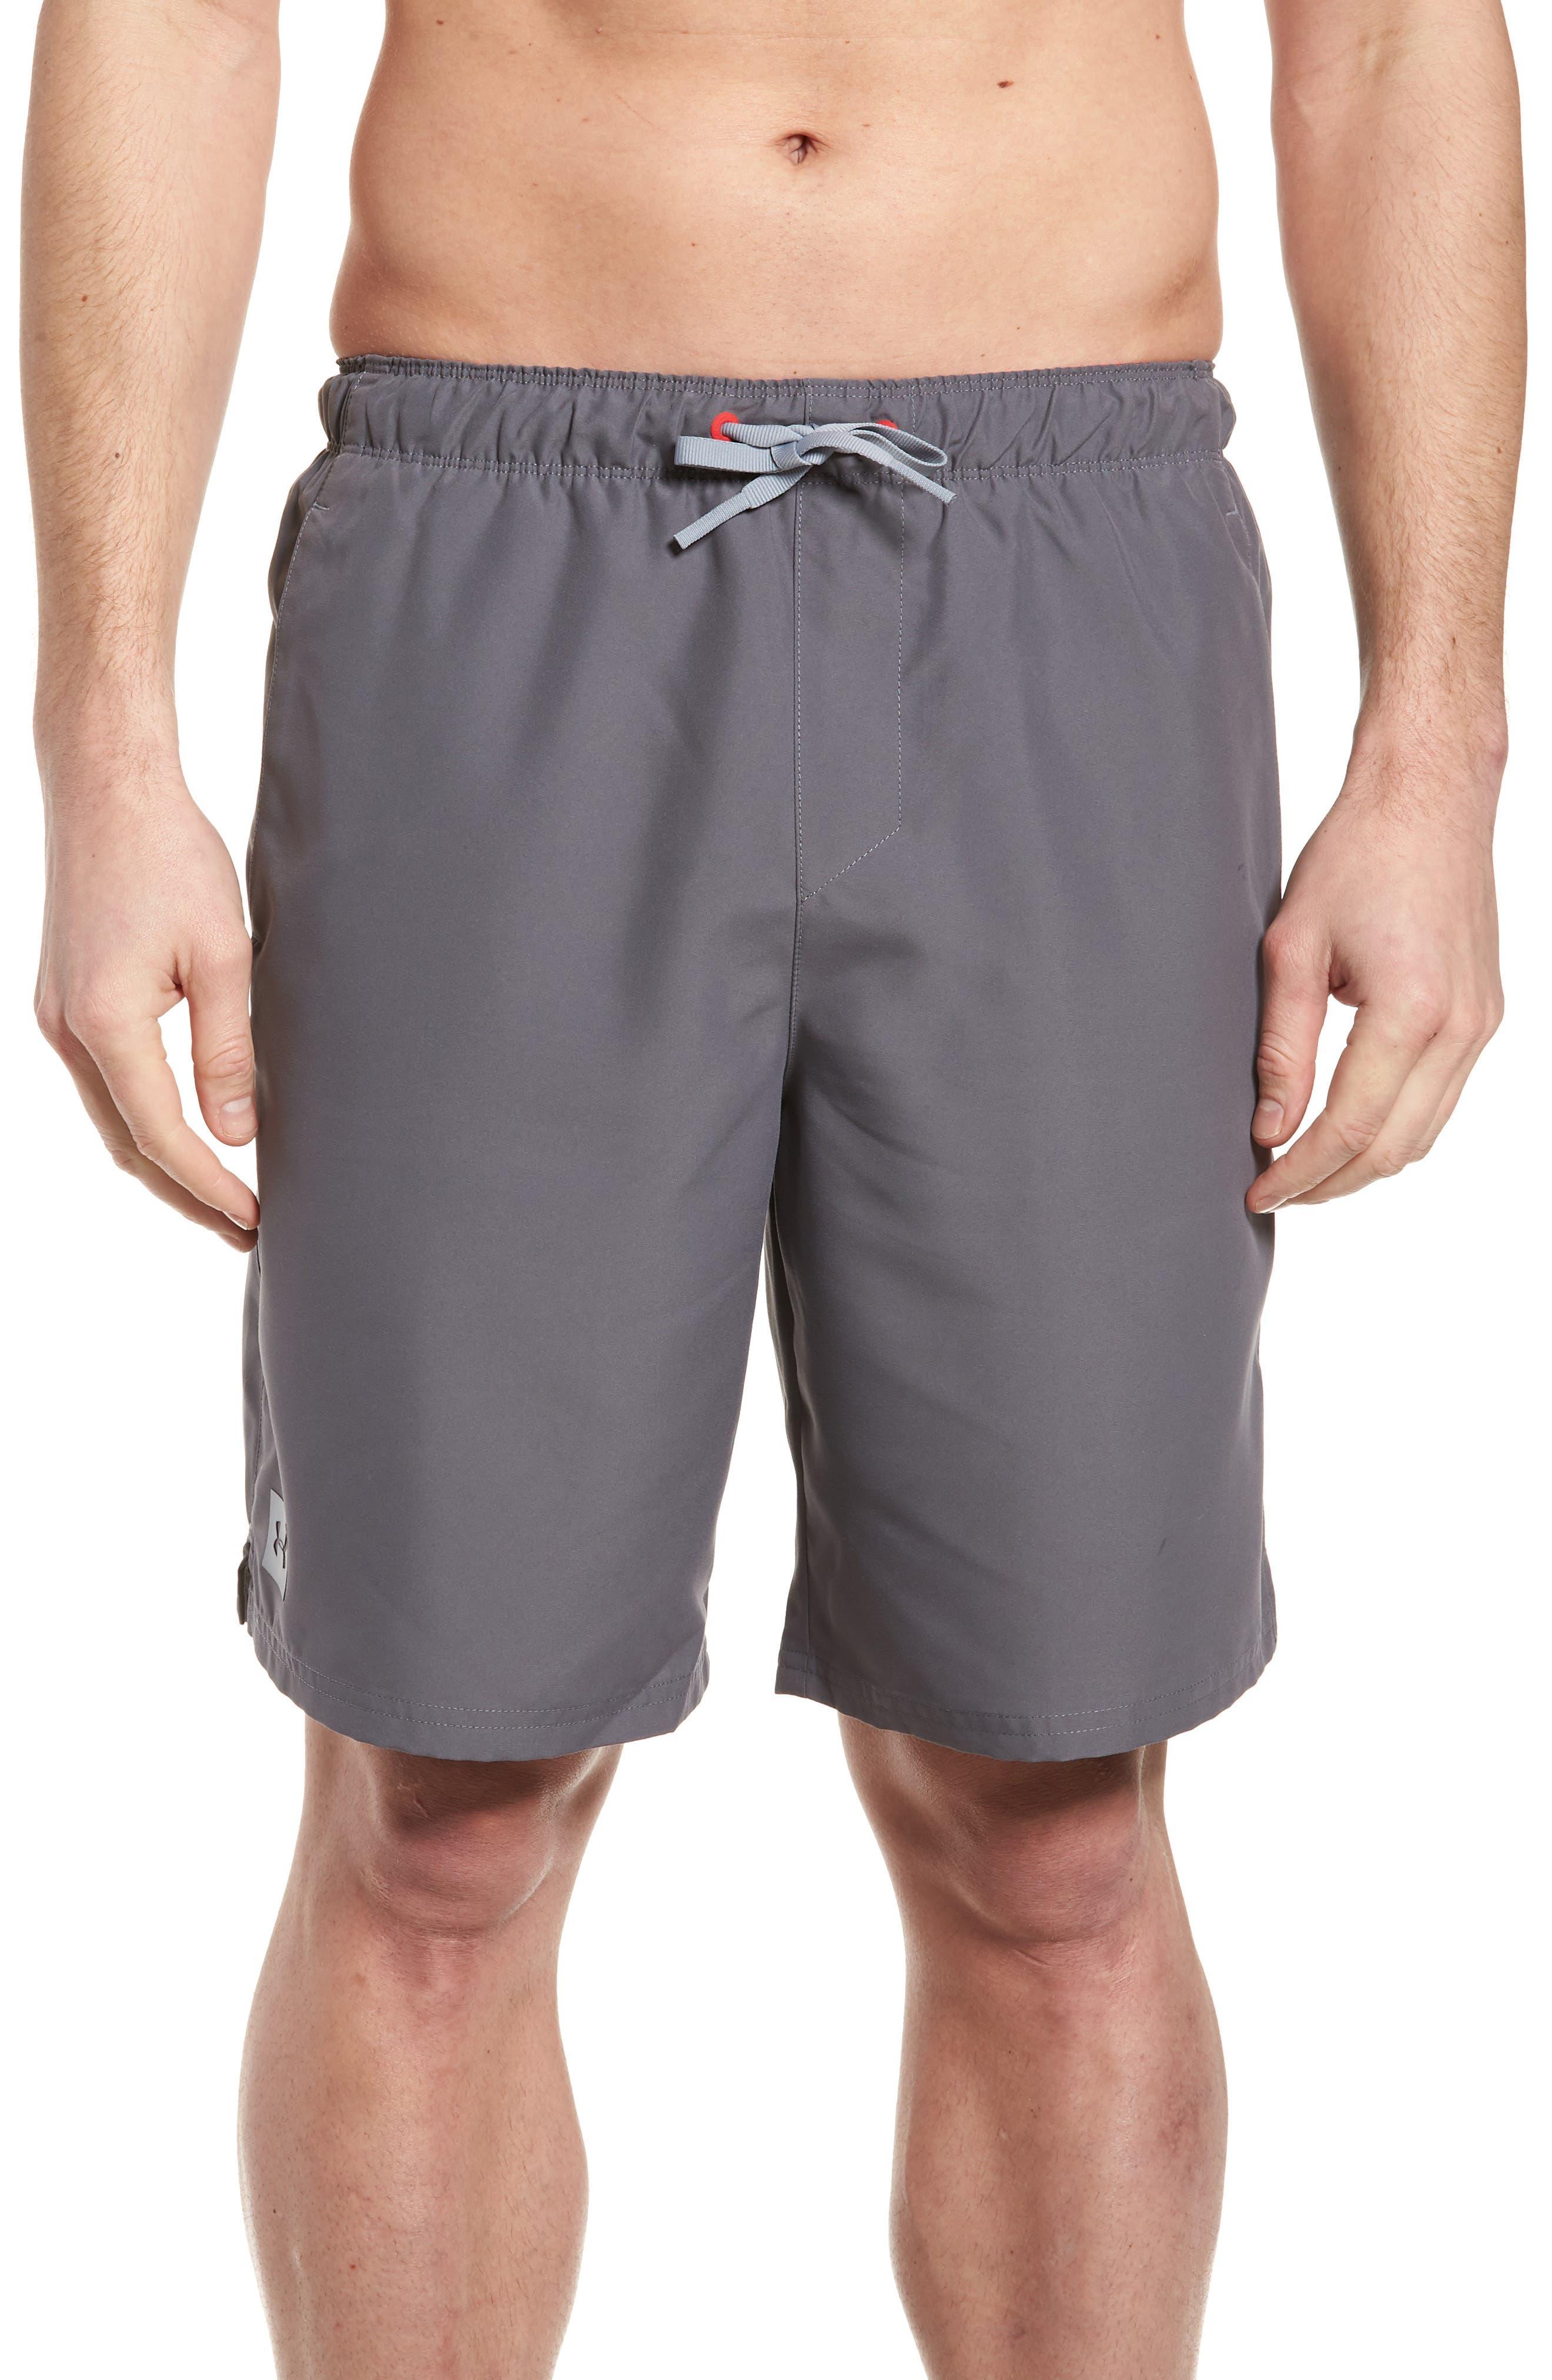 Mania Athletic Shorts,                             Main thumbnail 1, color,                             Graphite / Pierce / Grey